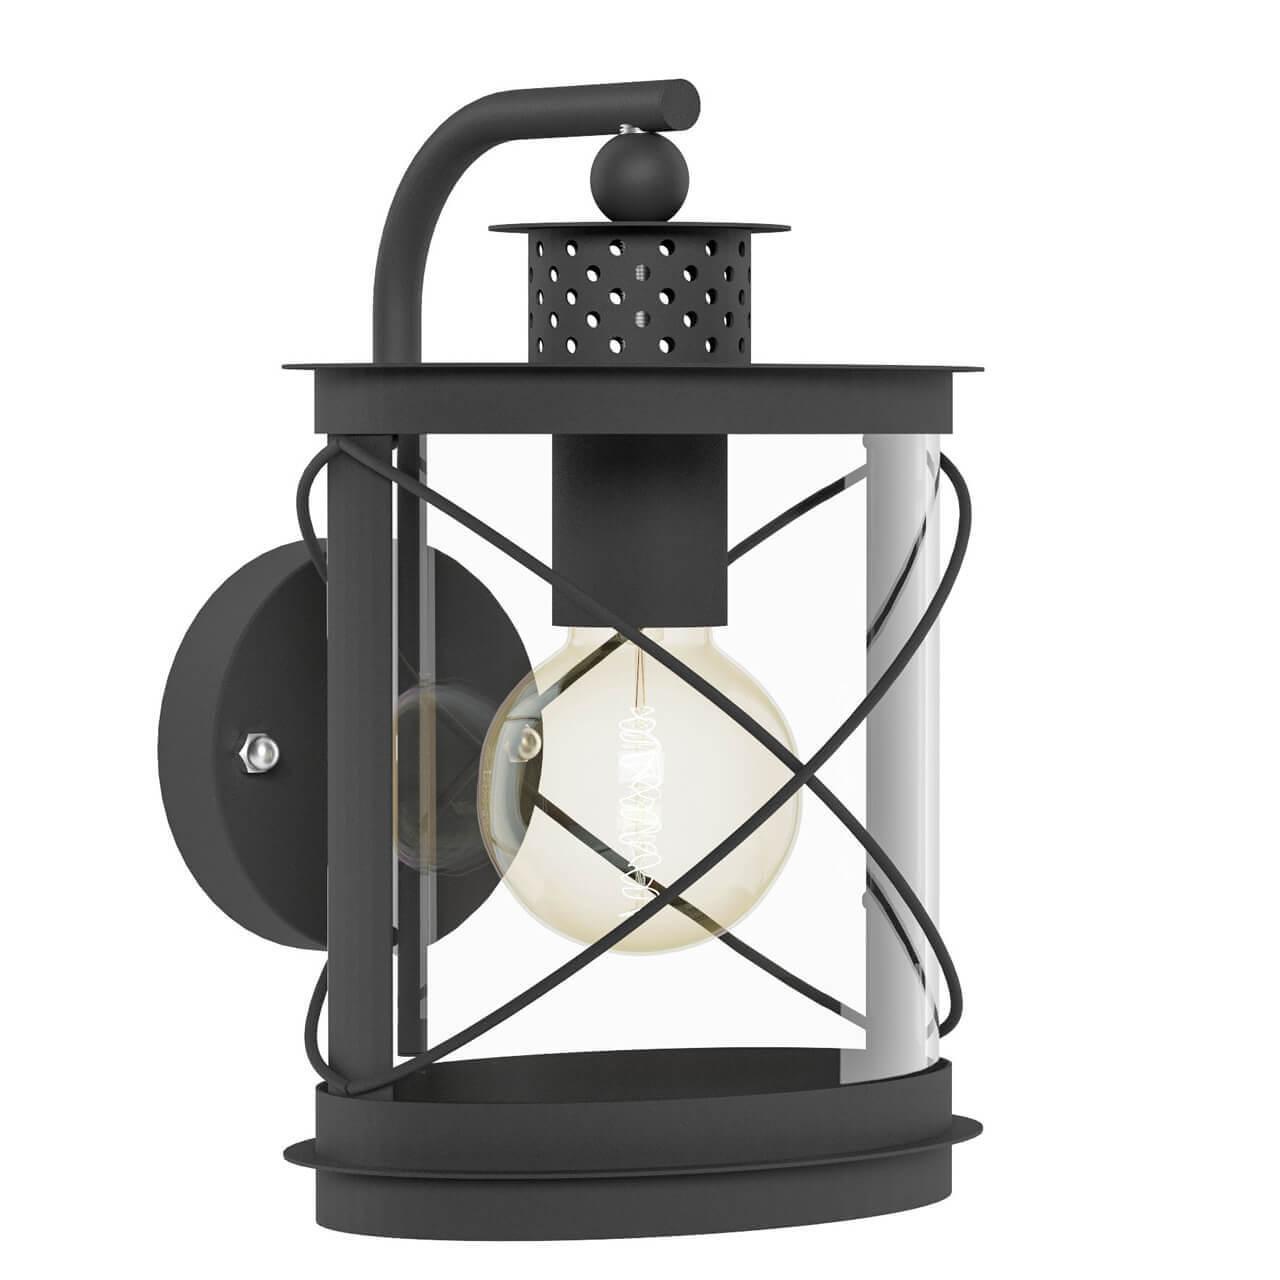 Светильник Eglo 94843 Hilburn eglo светильник уличный hilburn 94843